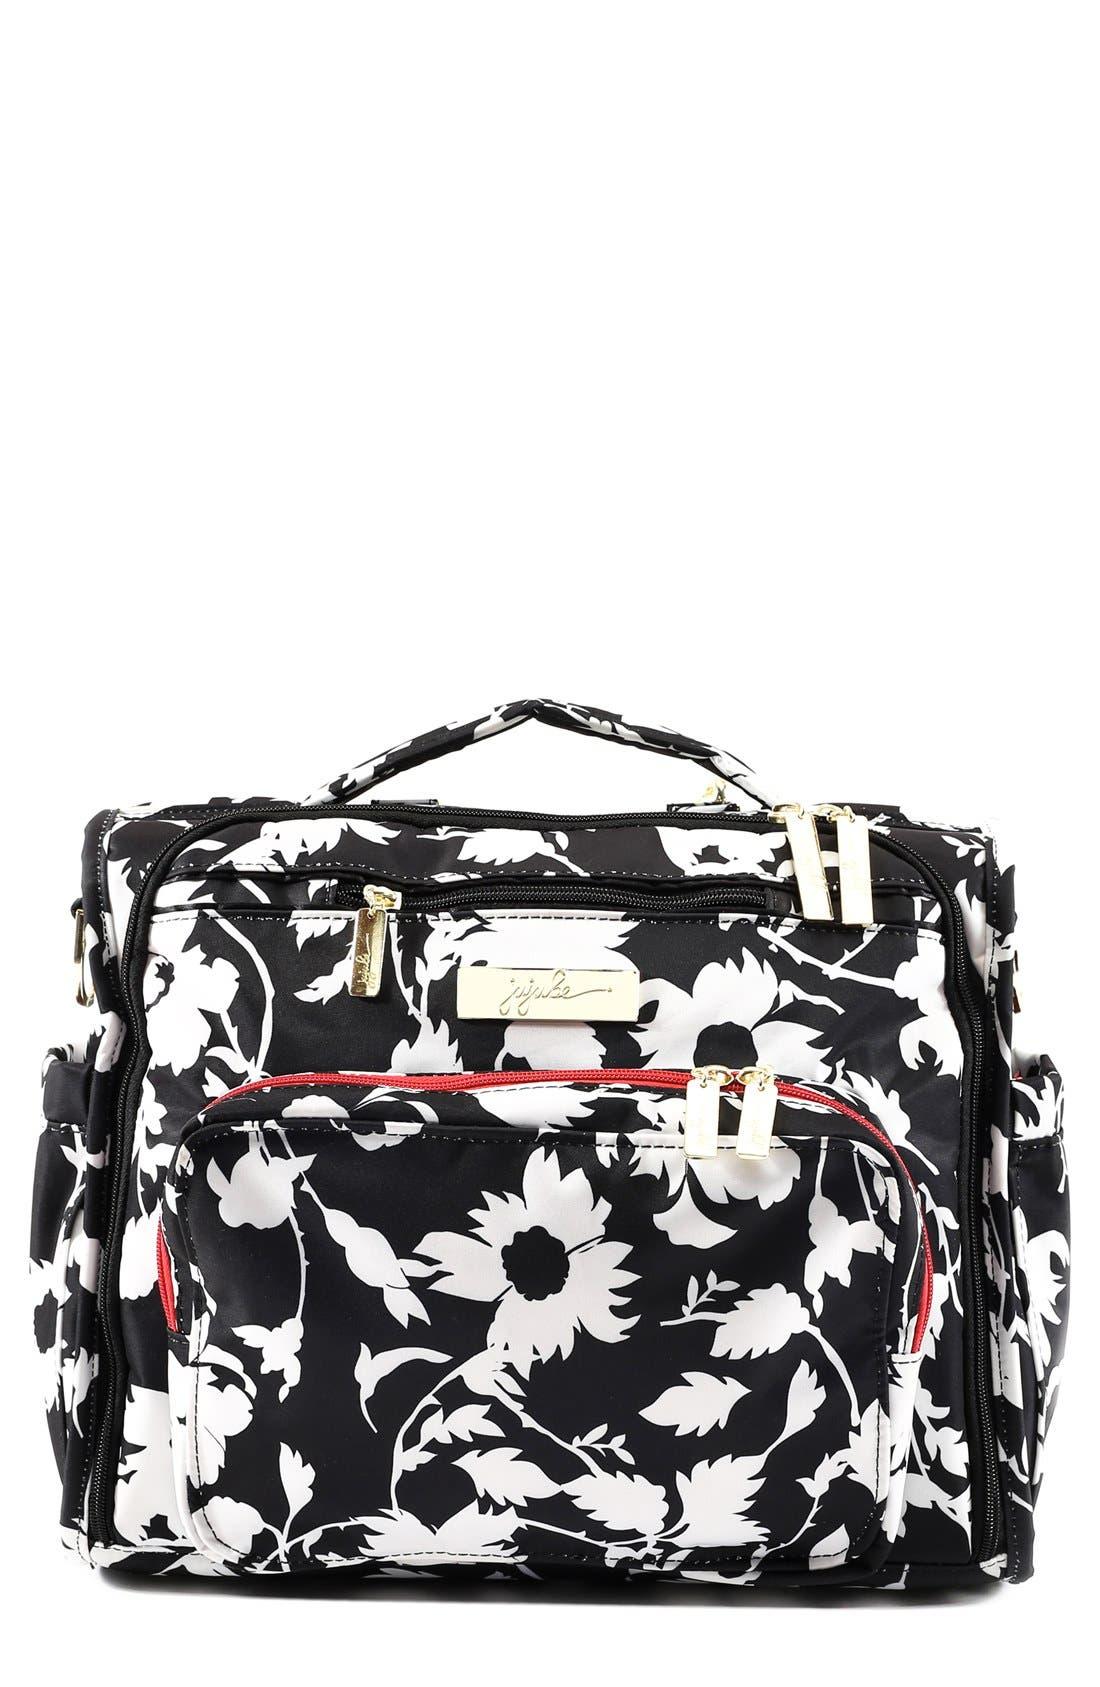 'Legacy BFF' Diaper Bag,                         Main,                         color, THE IMPERIAL PRINCESS